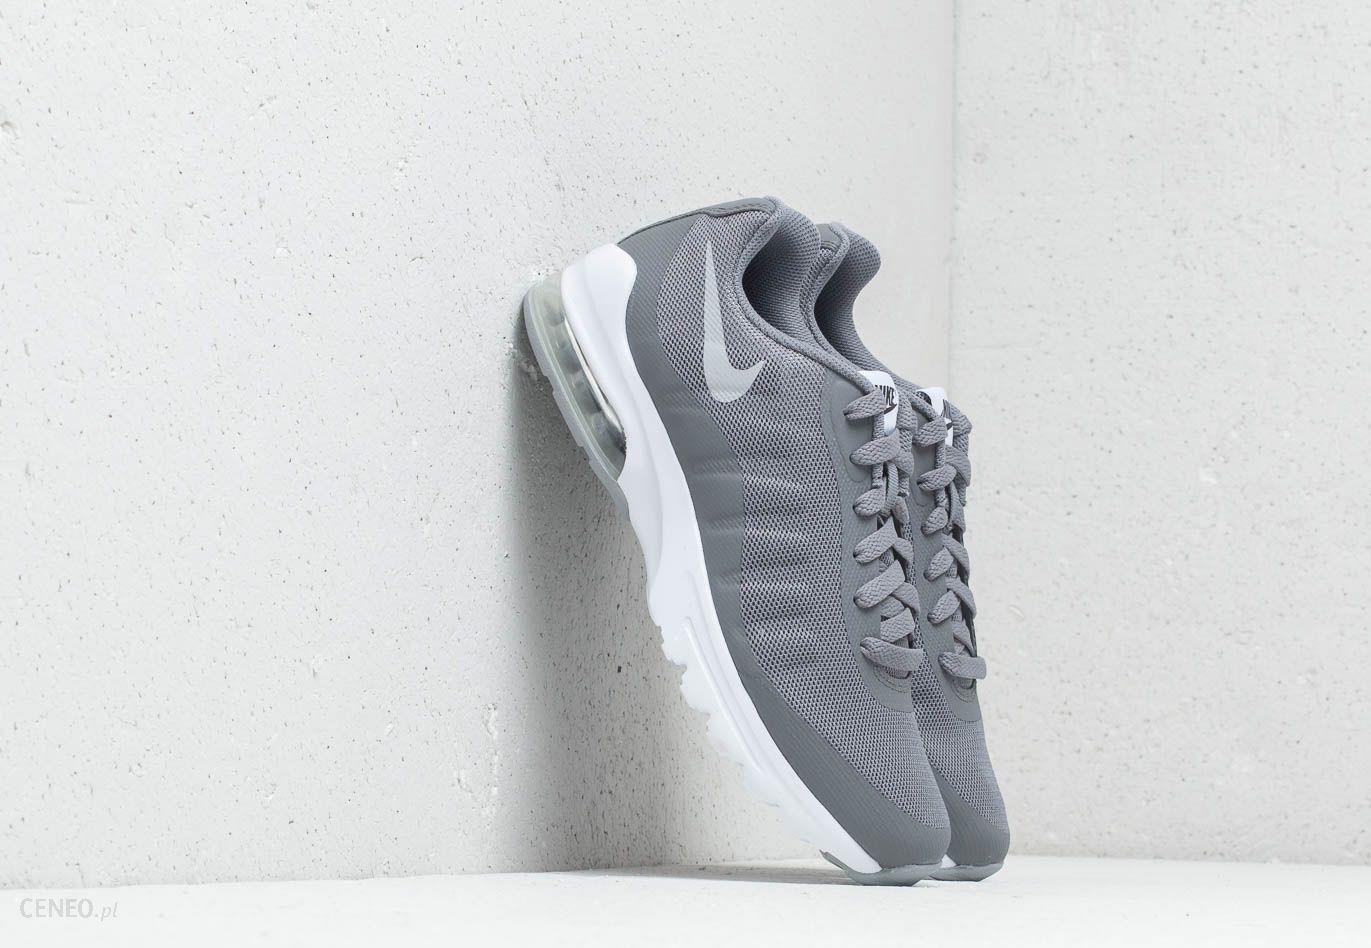 Nike Air Max Grey oferty Ceneo.pl